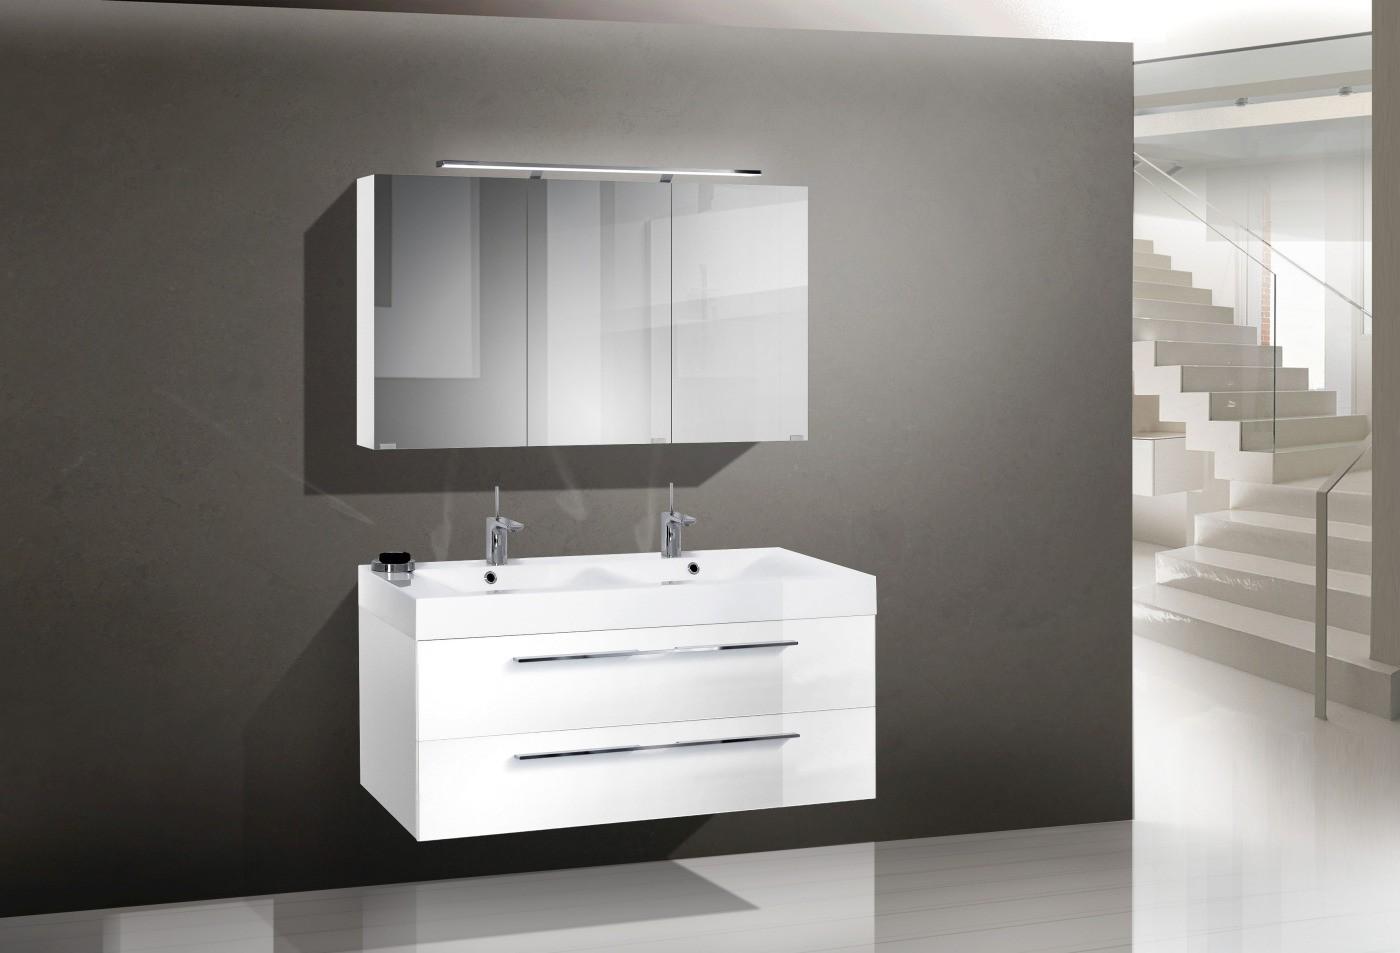 badm bel set mit doppelwaschtisch 120 cm 987. Black Bedroom Furniture Sets. Home Design Ideas